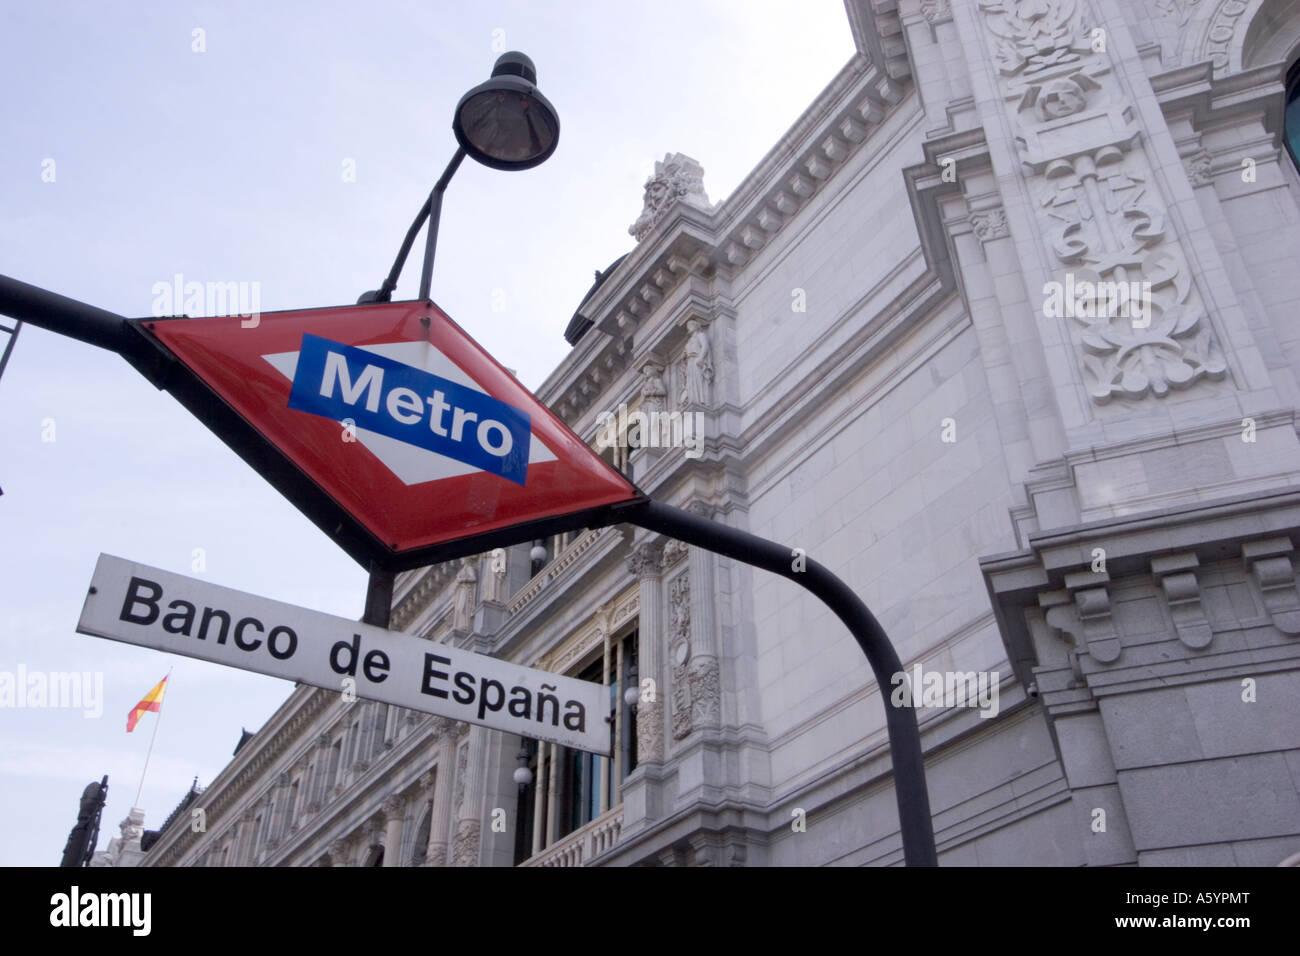 Banco de espana Metro Madrid underground tube service sign on ...